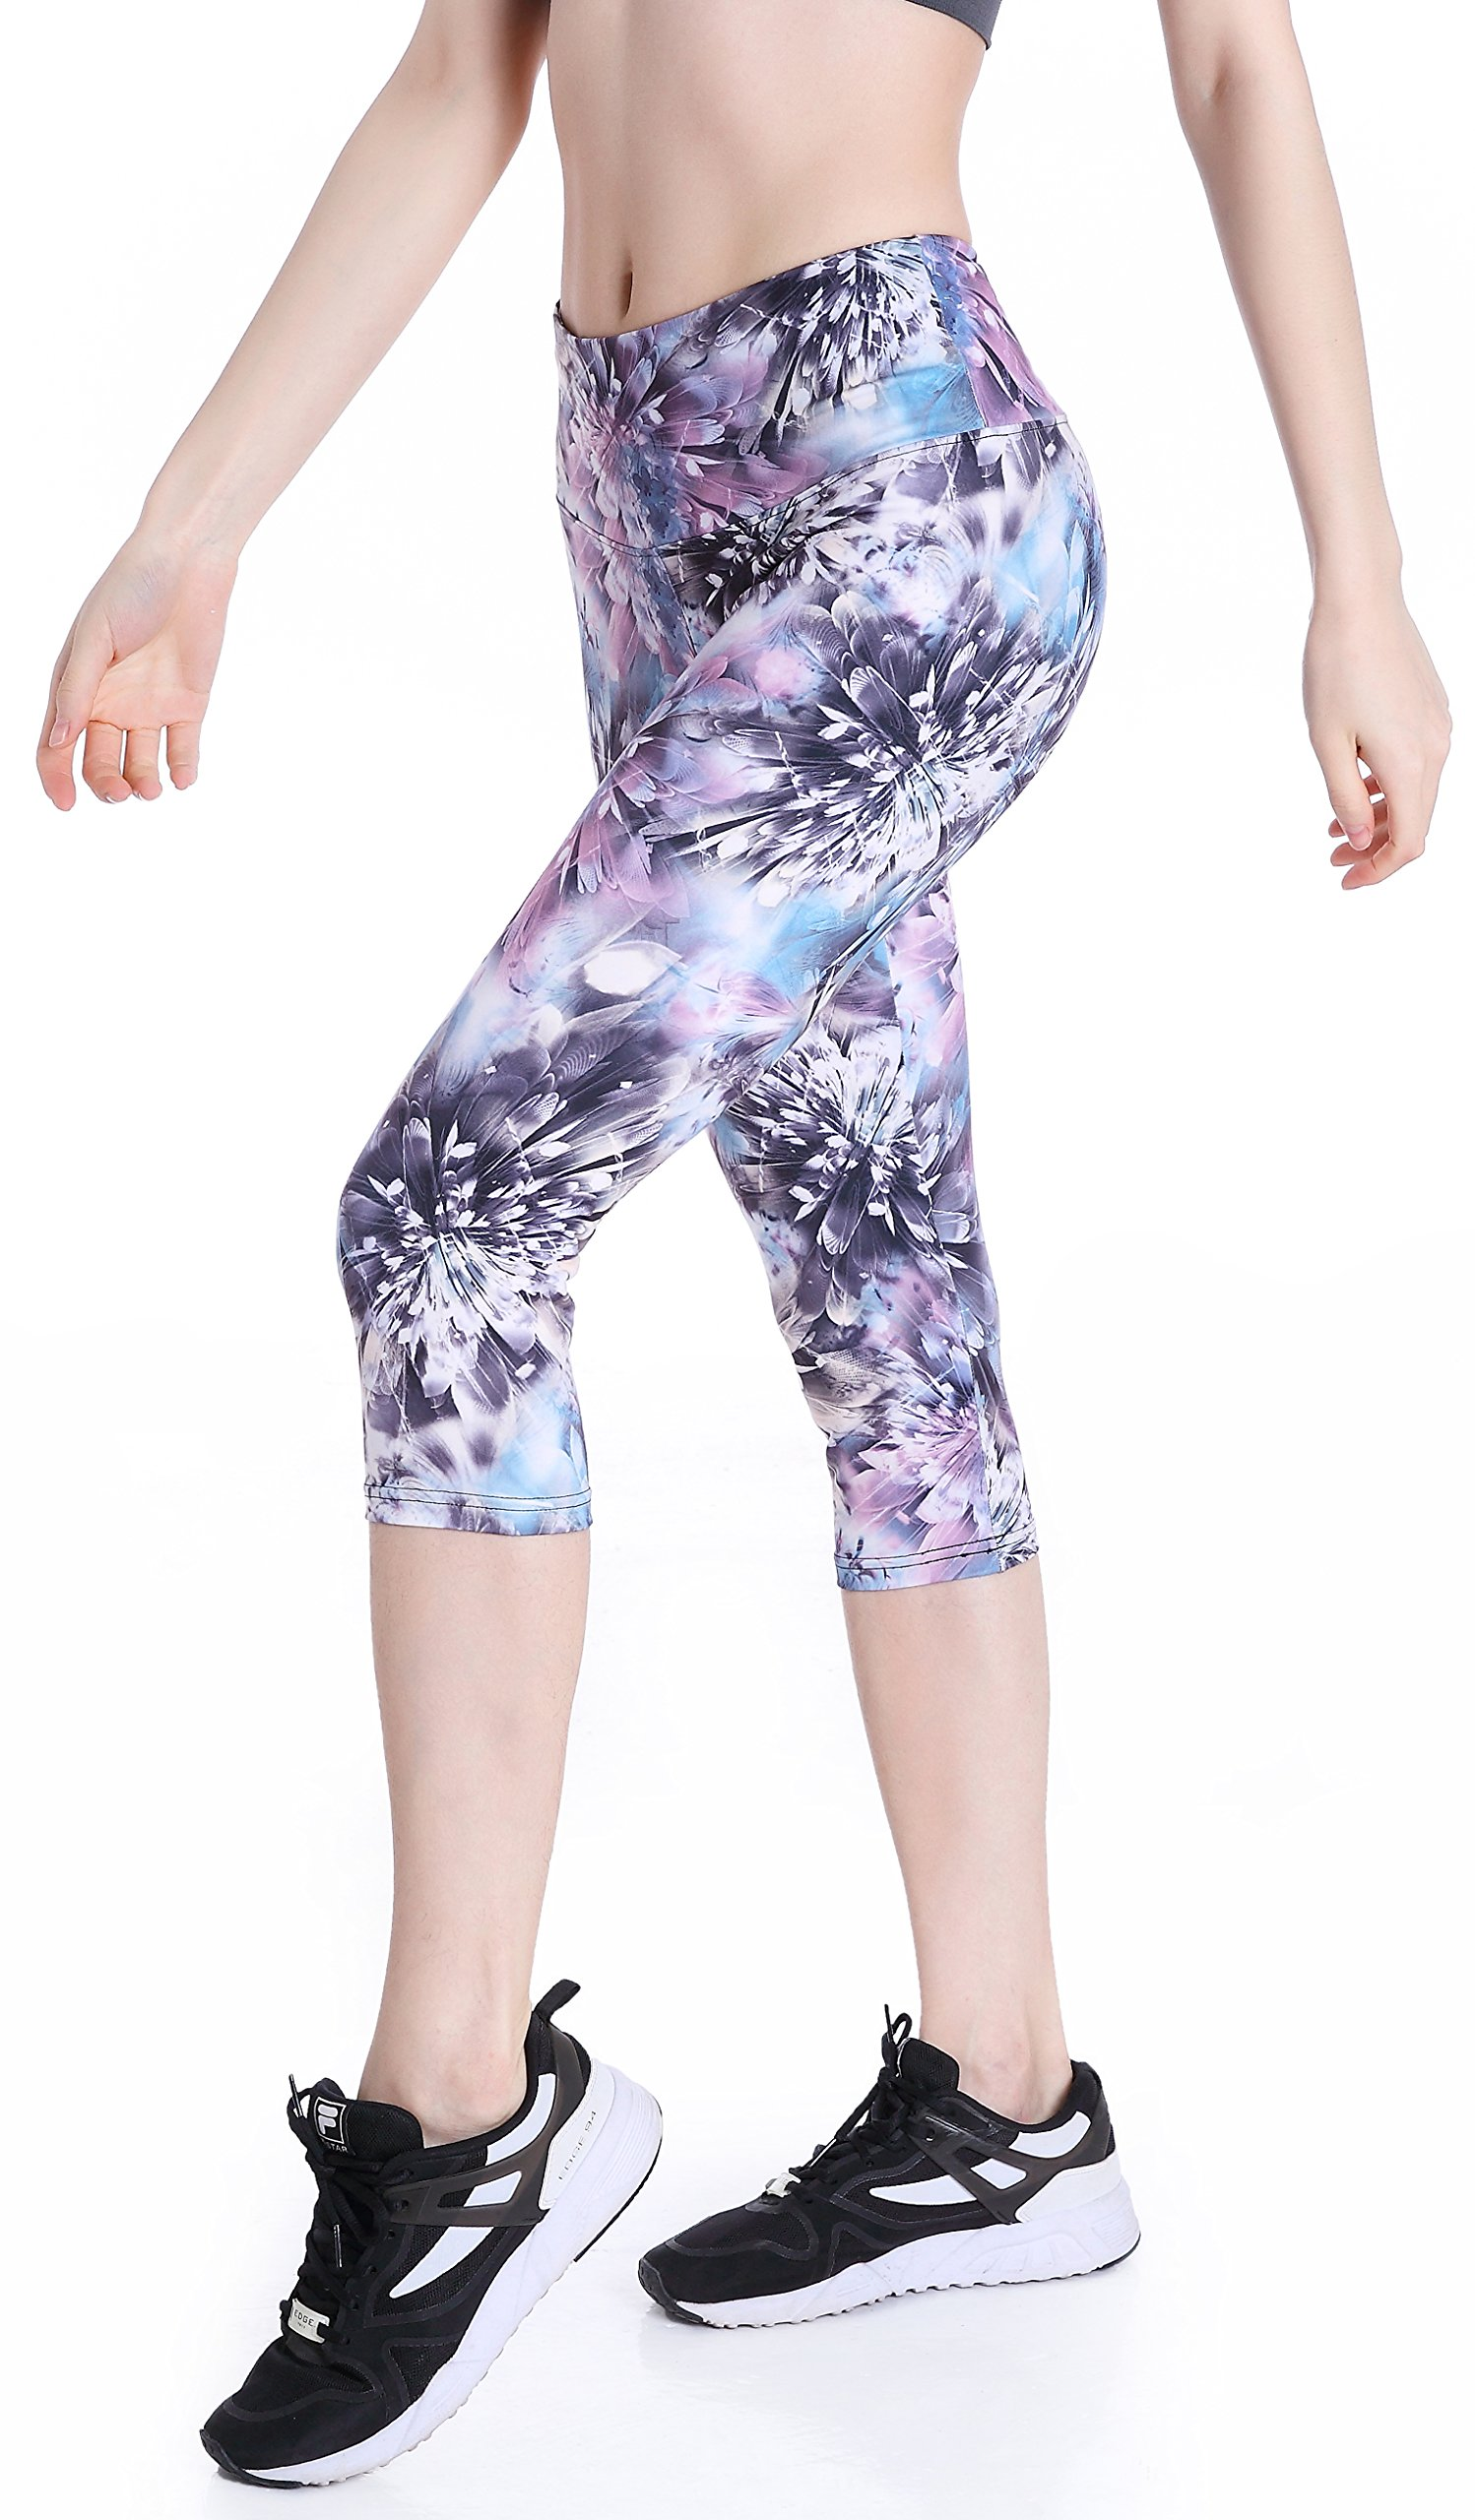 Picotee Women's High Waist Tummy Control Yoga Pants Workout Capri Leggings w Hidden Pocket (Diamond Flower, L)